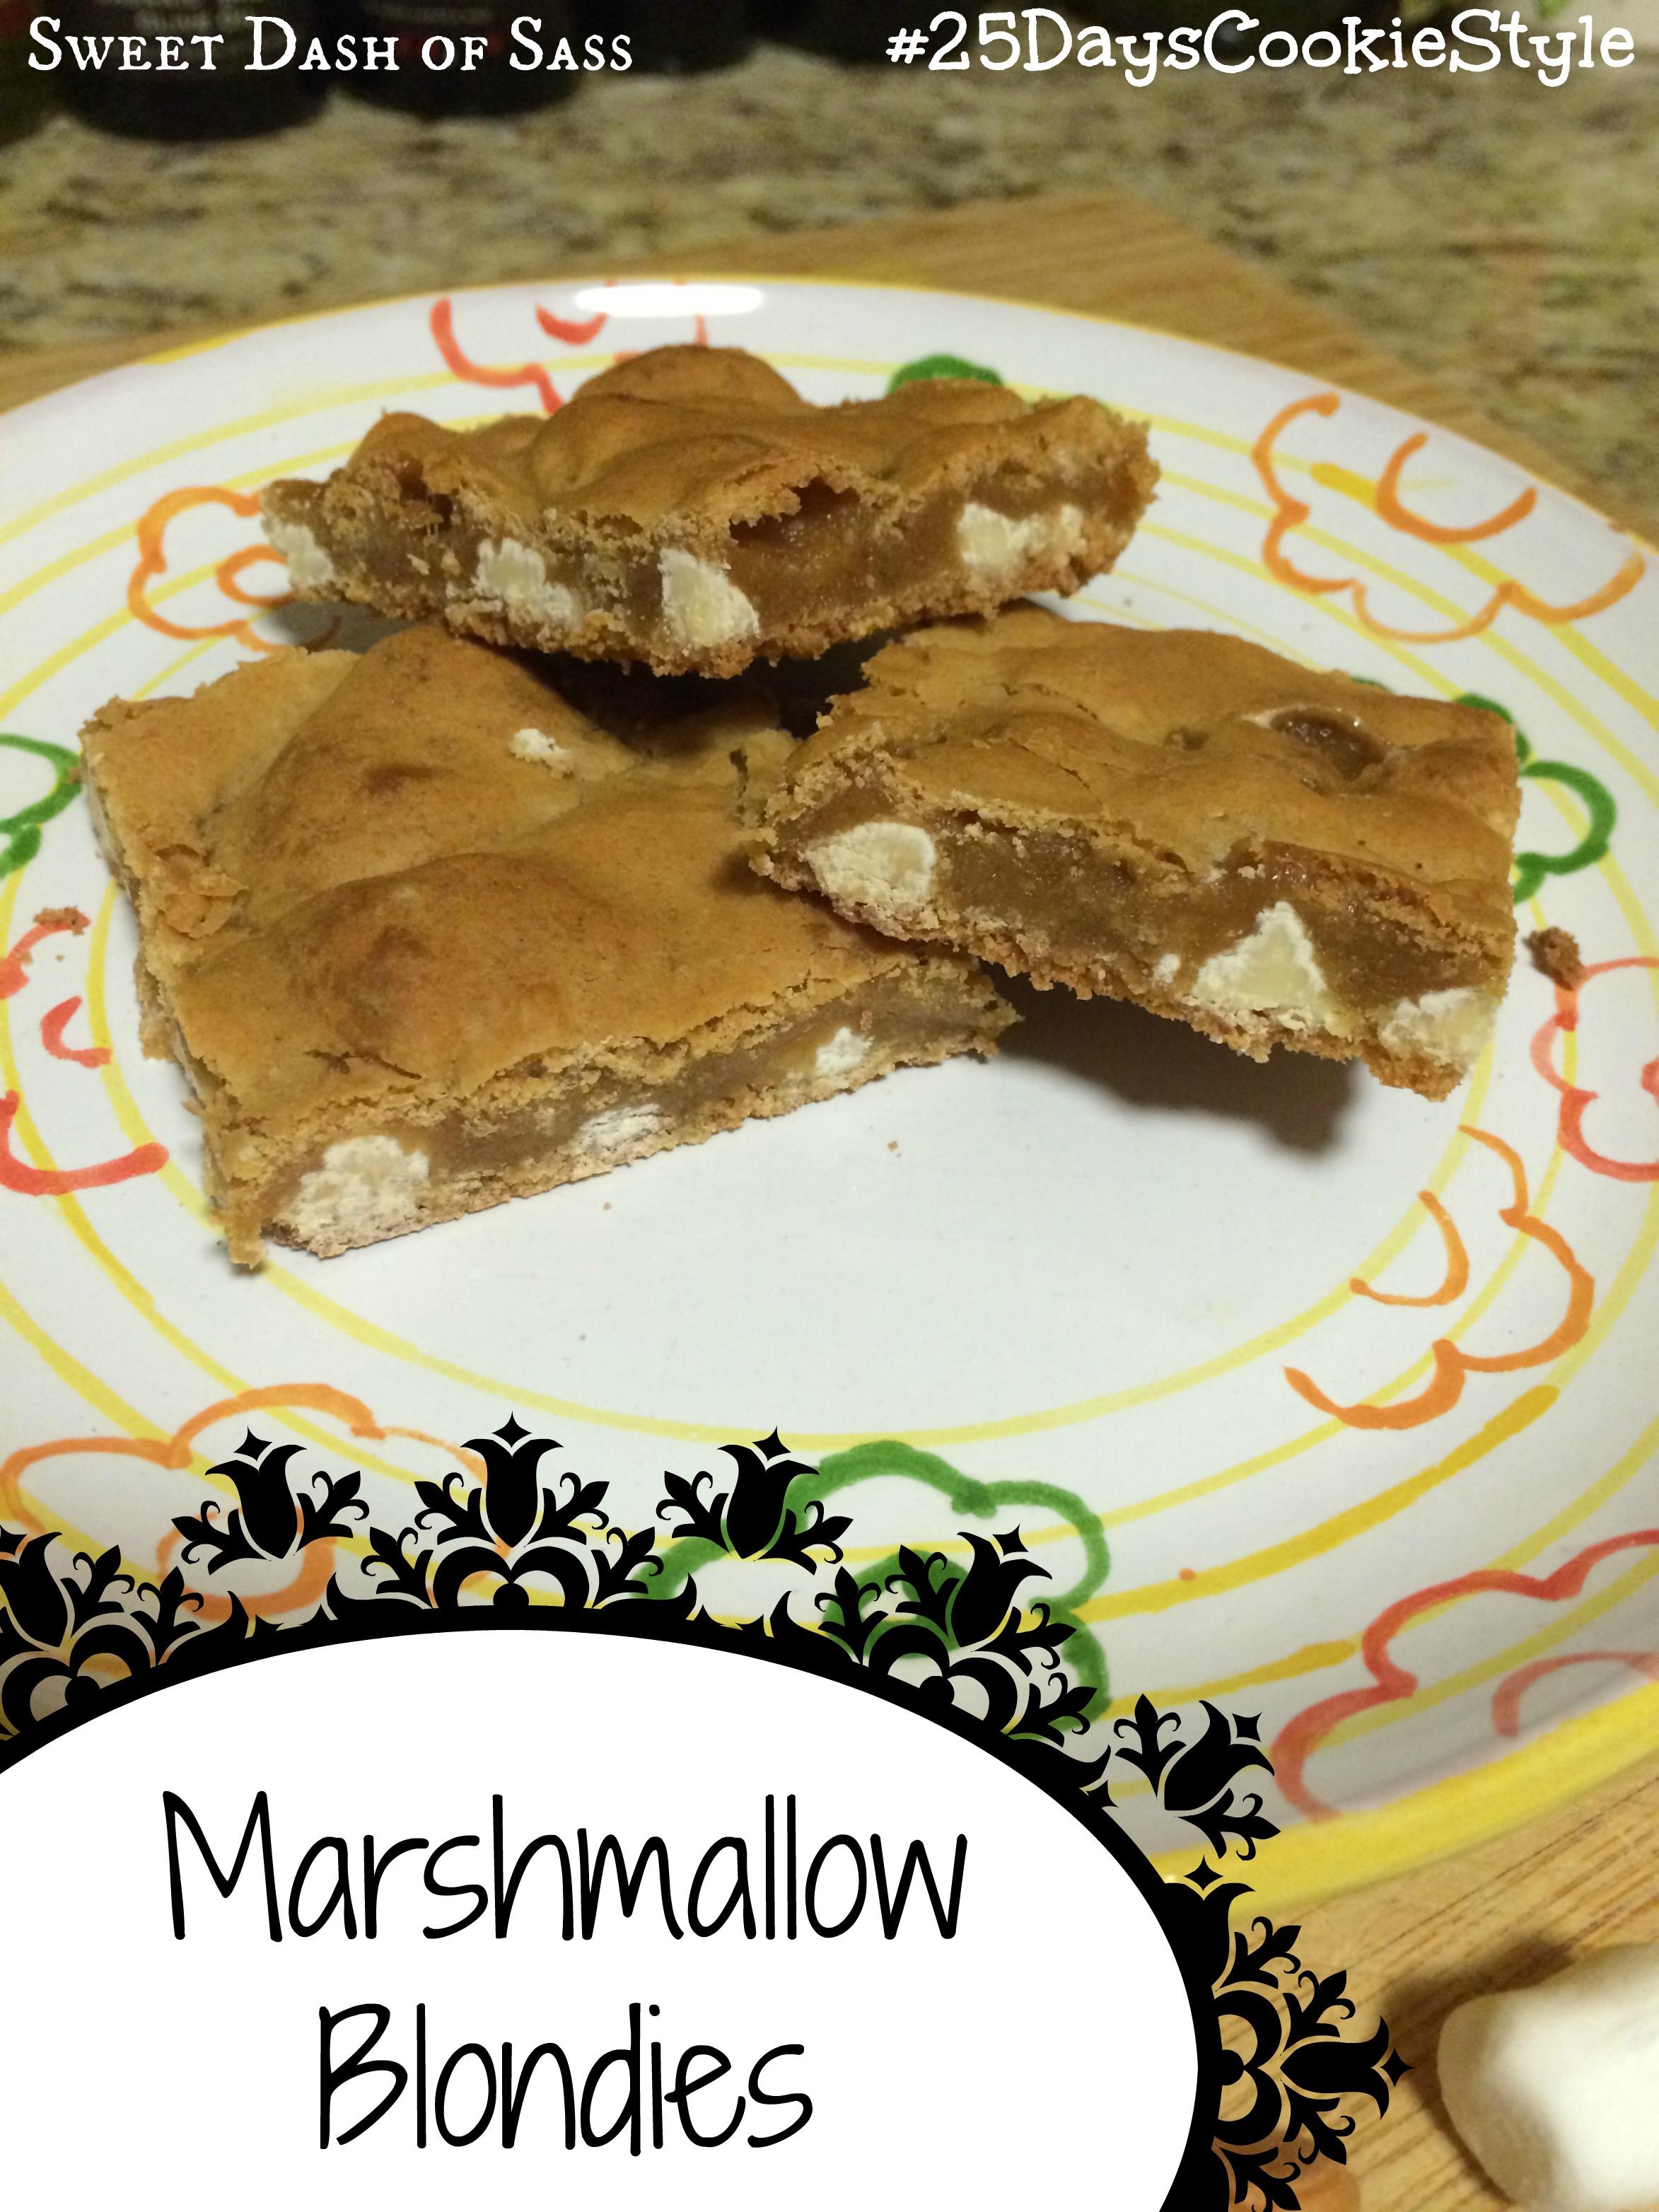 Marshmallow Blondies - #25DaysCookieStyle www.SweetDashofSass.com